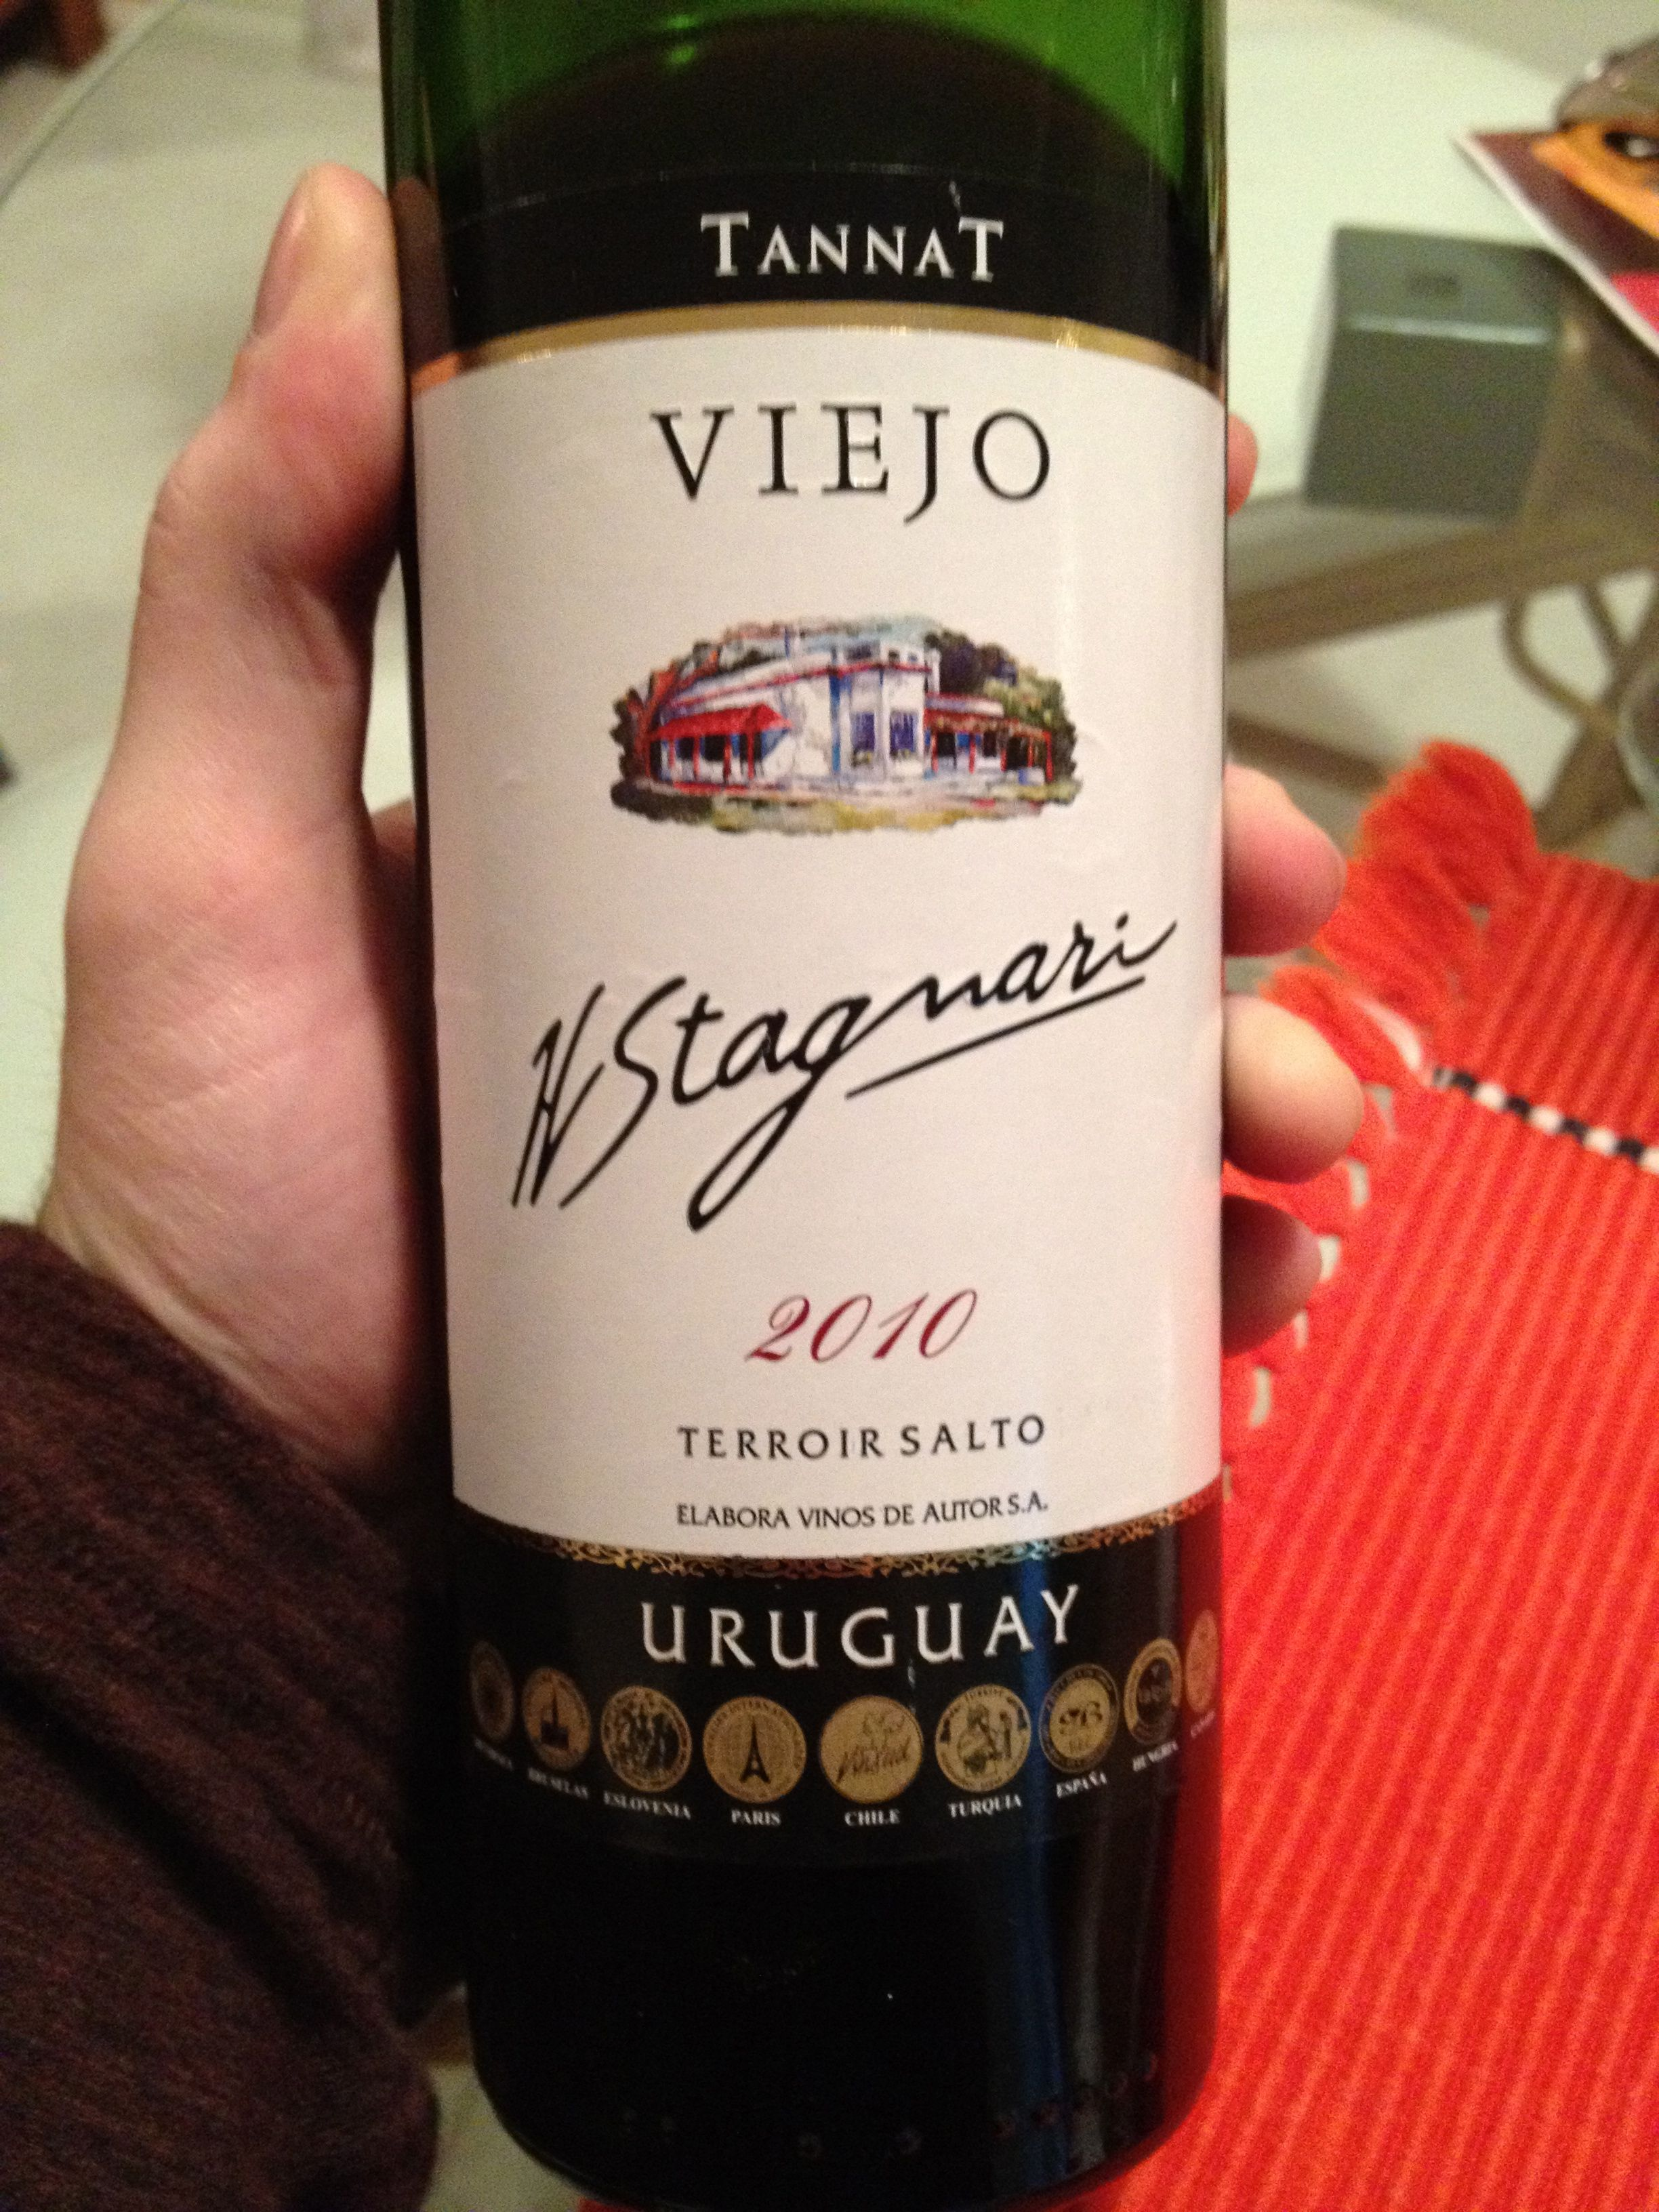 Viejo Tannat 2010 H Stagnari Salto Uruguay Wine Drinks Wine Bottle Wines